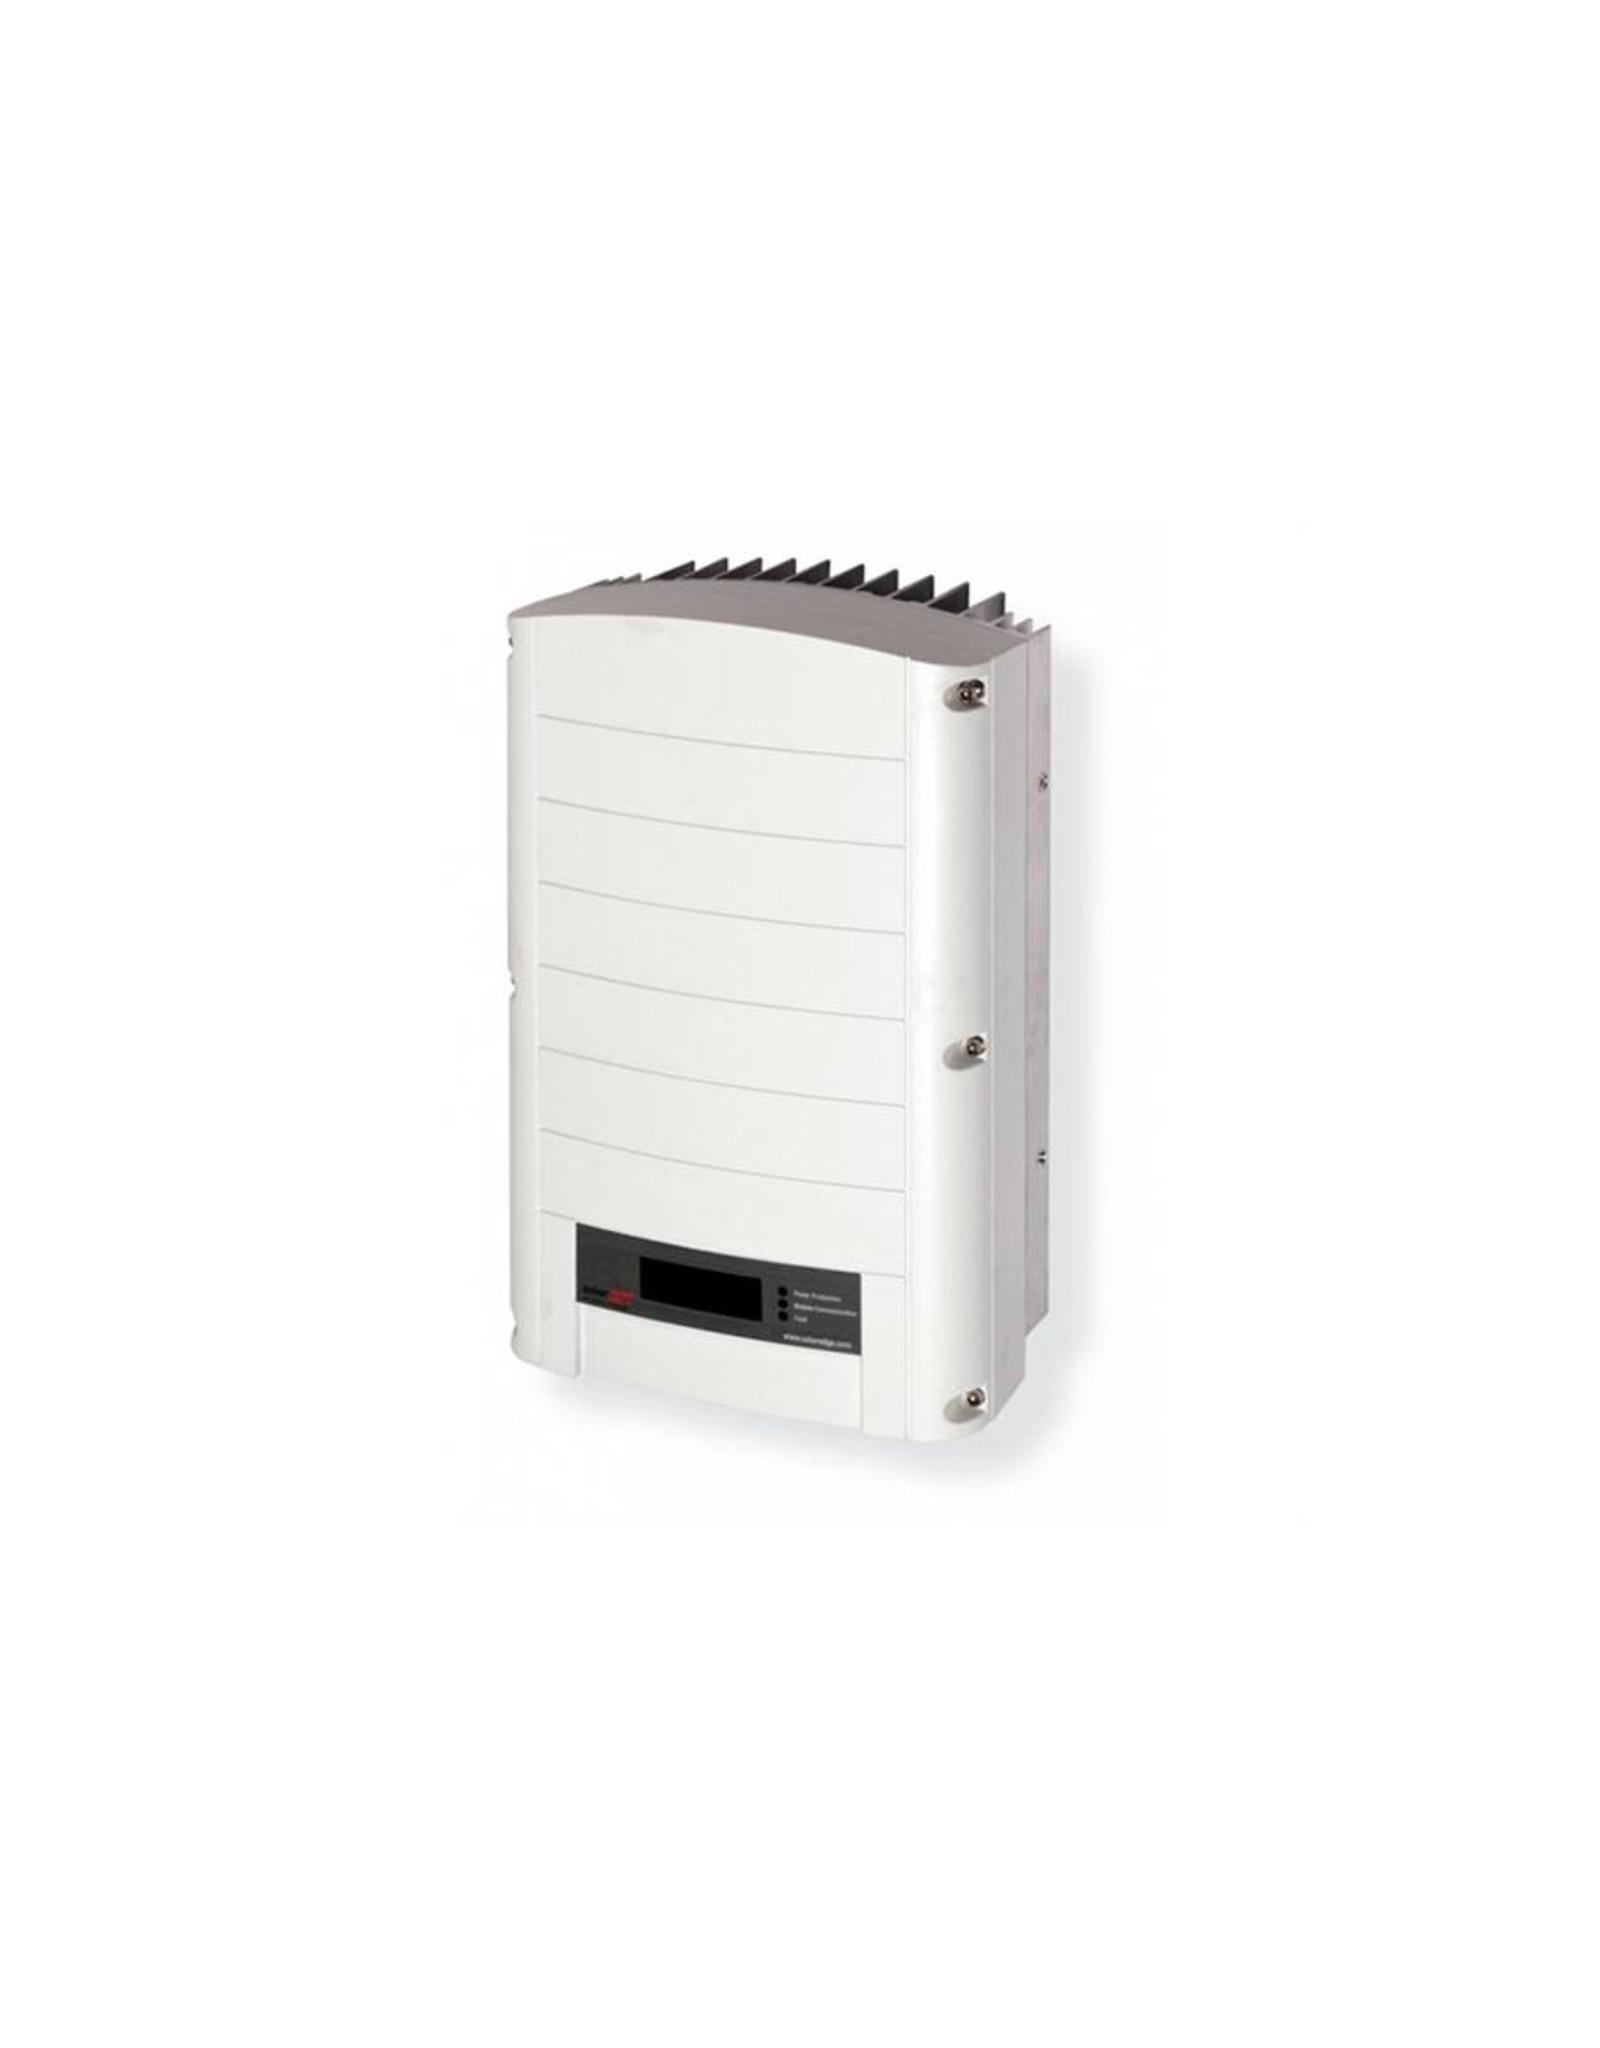 SolarEdge SolarEdge SE33.3K-RW048NNN2 /SE33.3K-RW048NGP2 driefase omvormer 33.3 kW, ethernet / ethernet + gsm